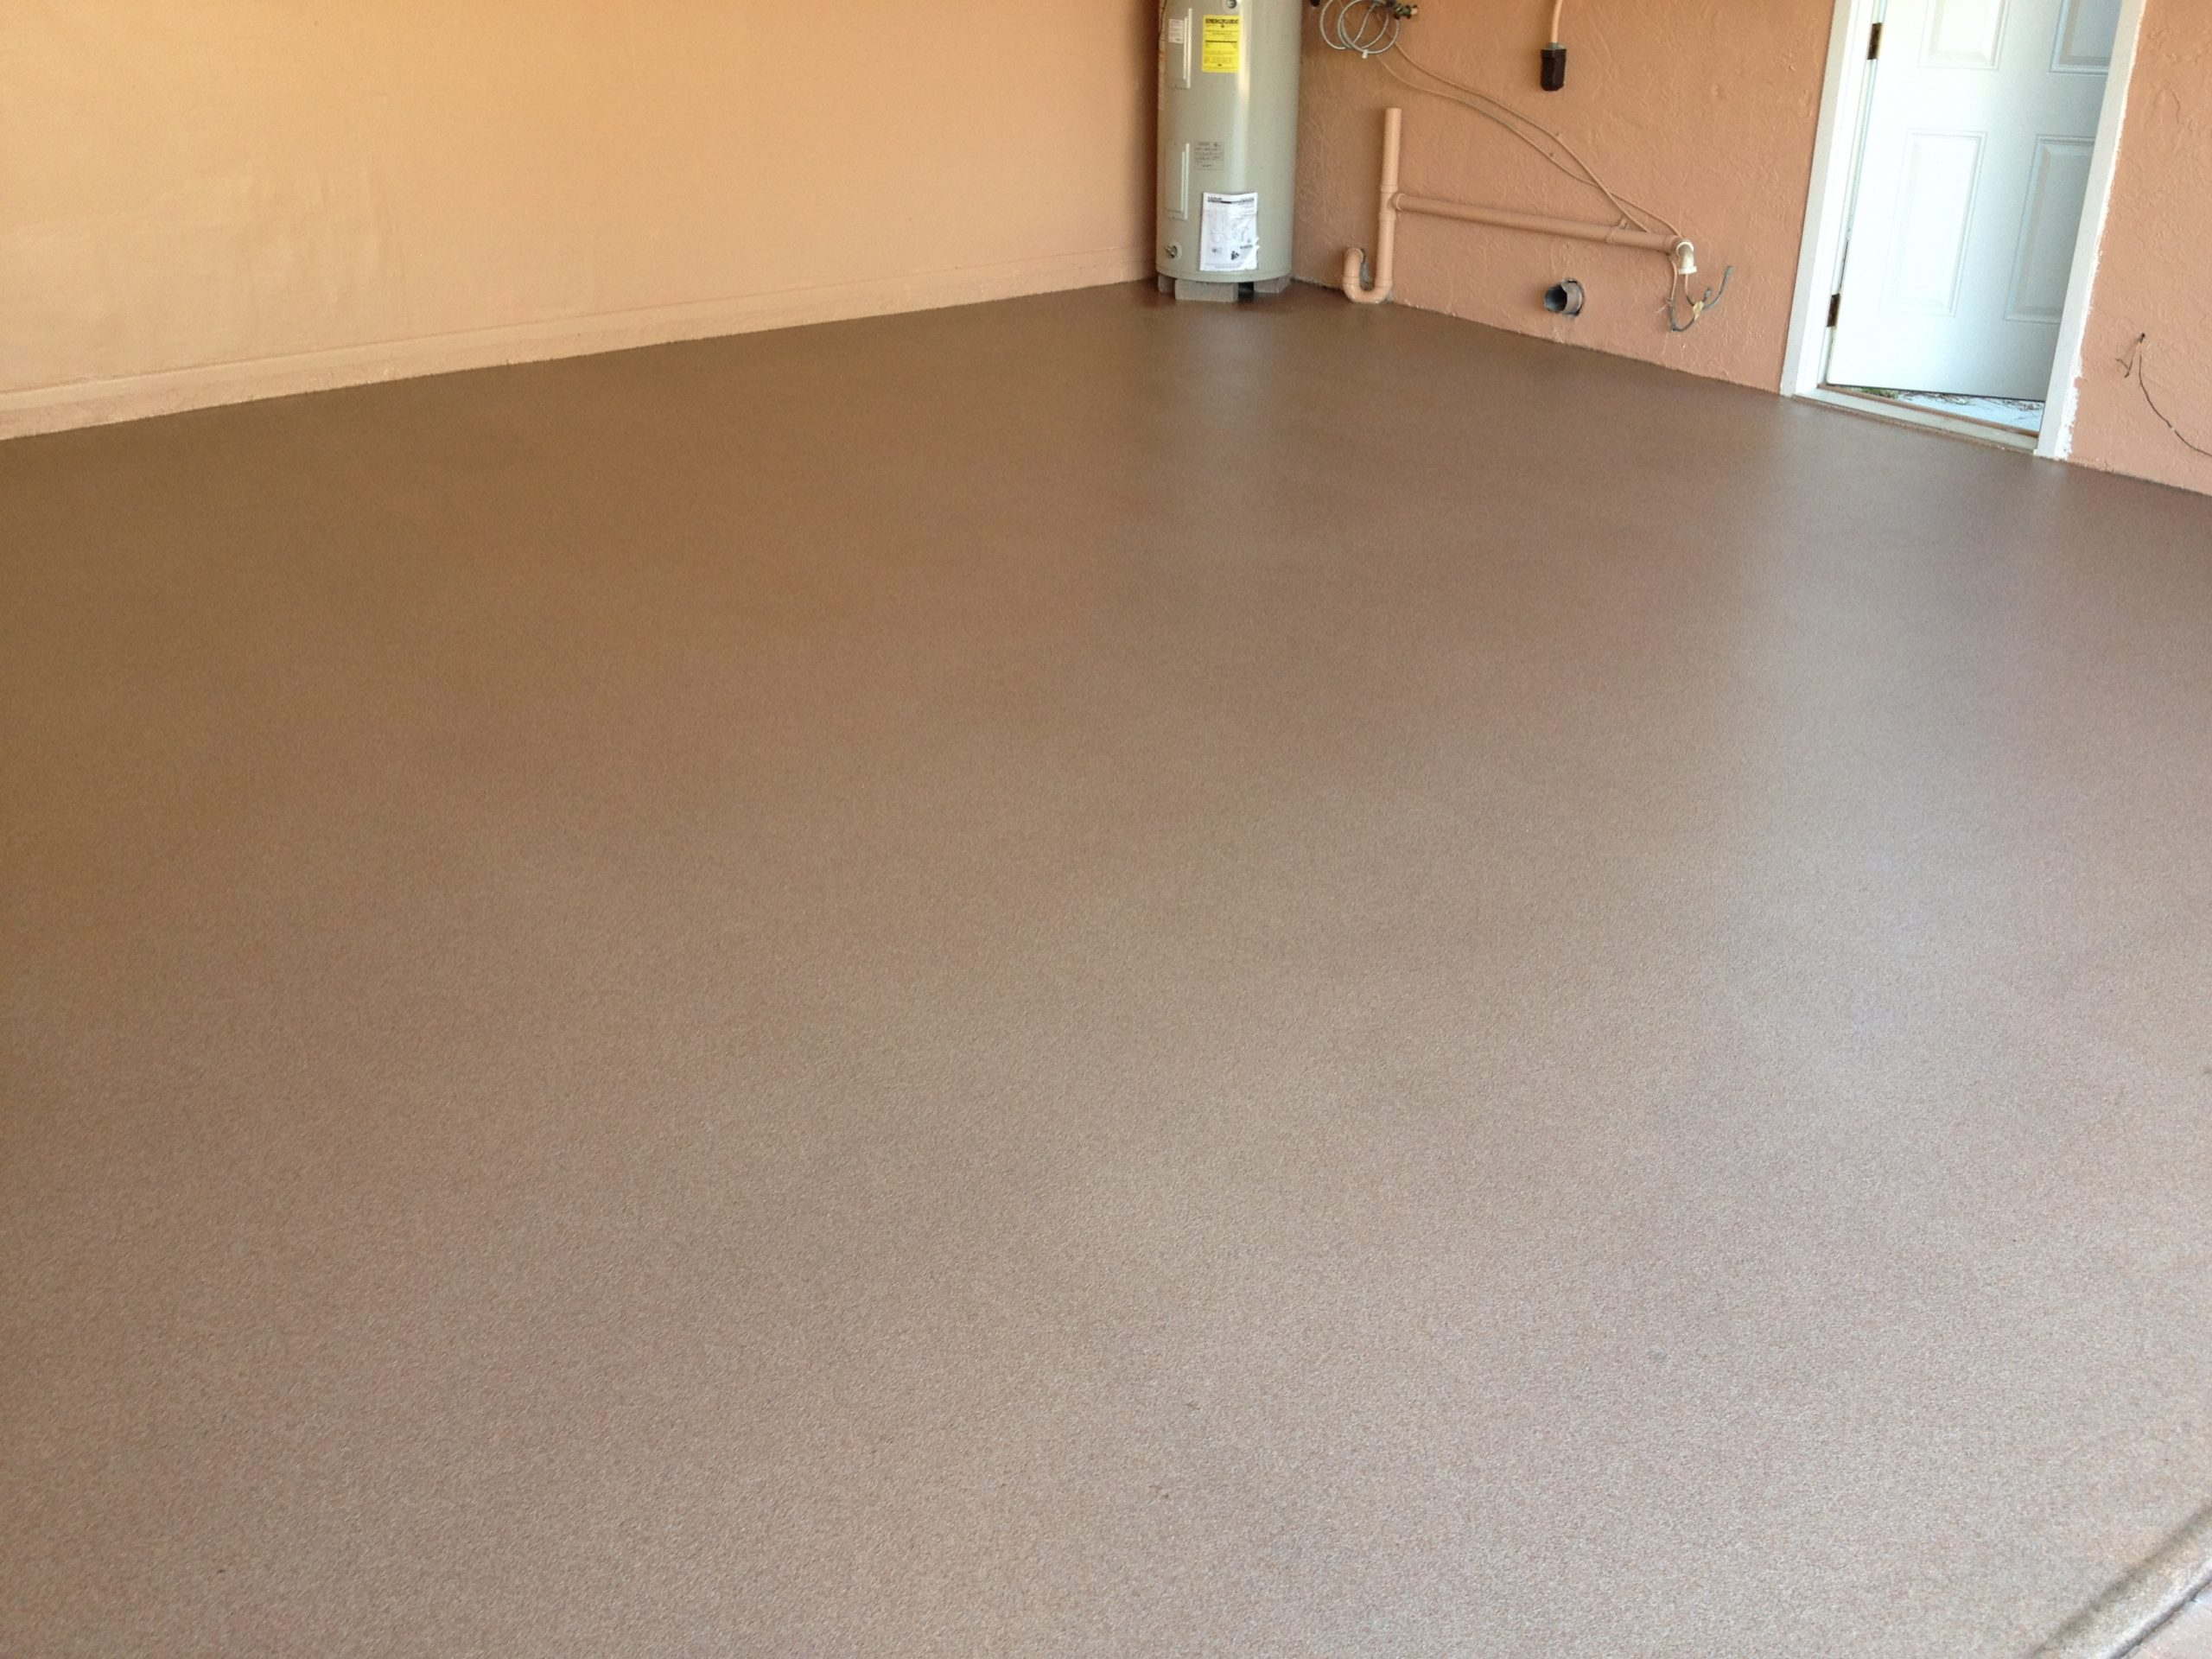 Garage Doctors Easy Clean Flooring in Florida Quartz